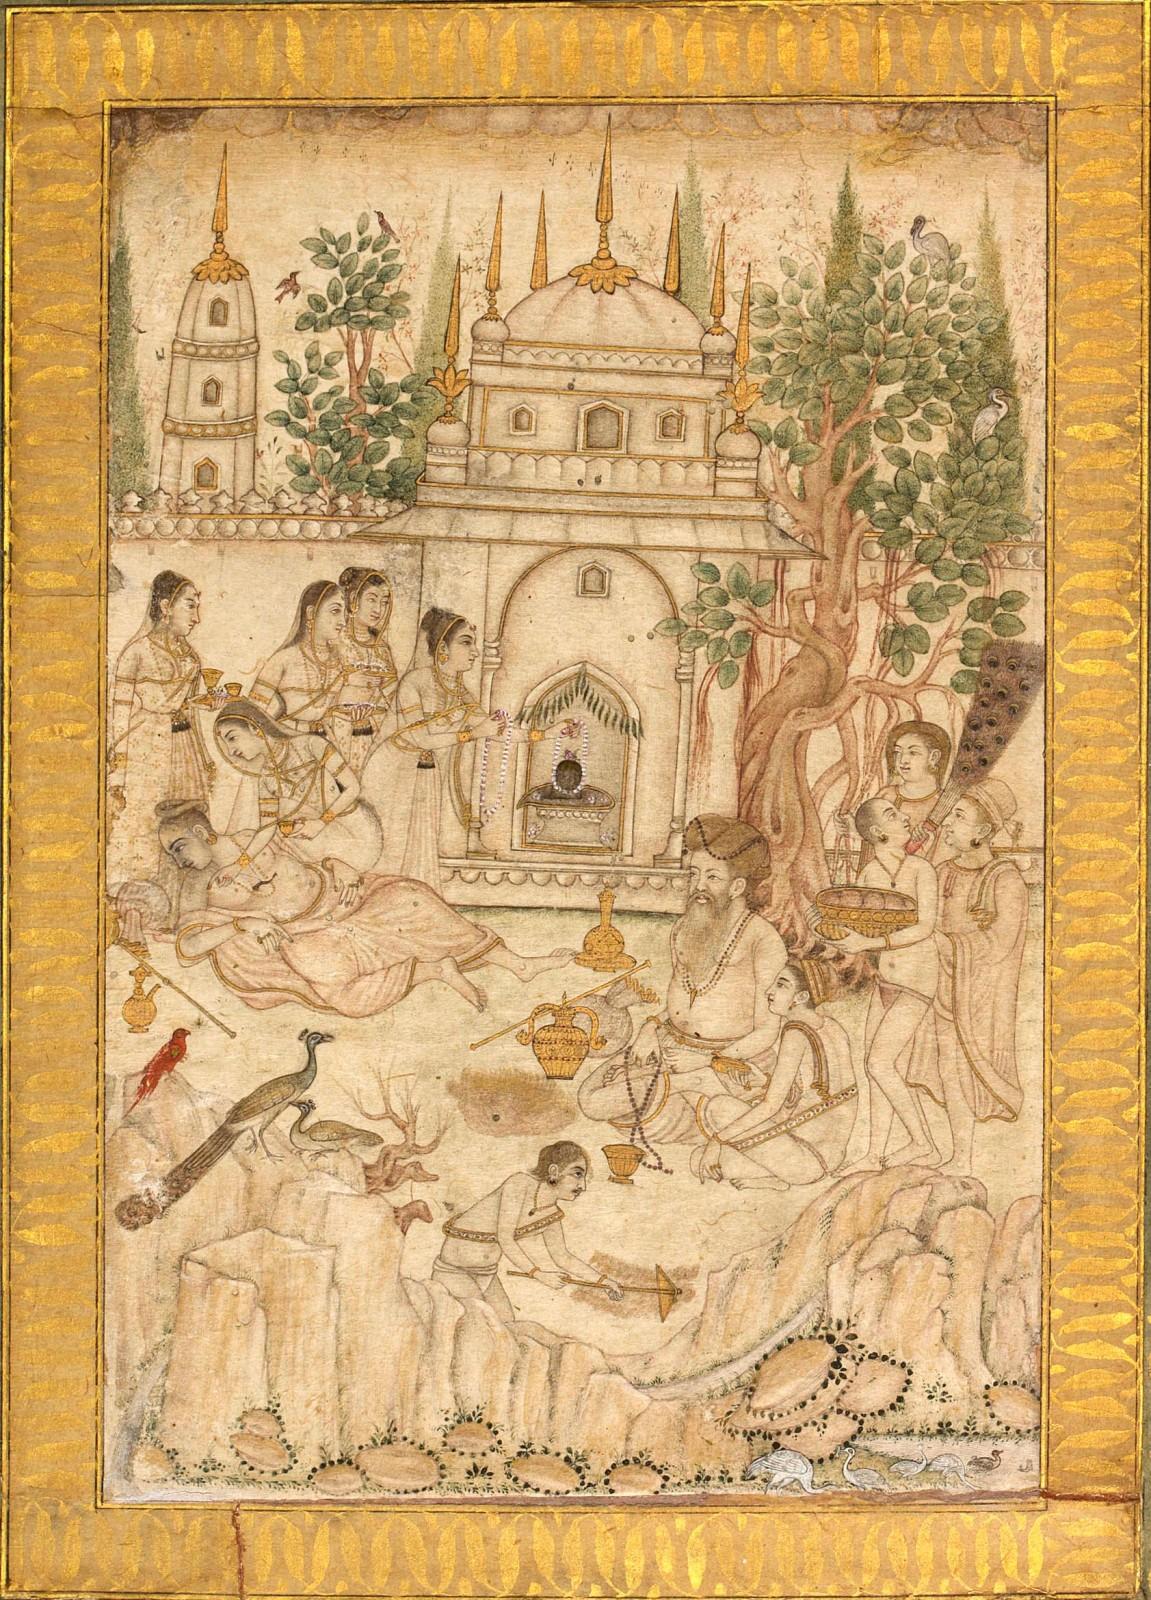 A Scene at a Shiva Temple, Mughal style in the Deccan, c. 1700